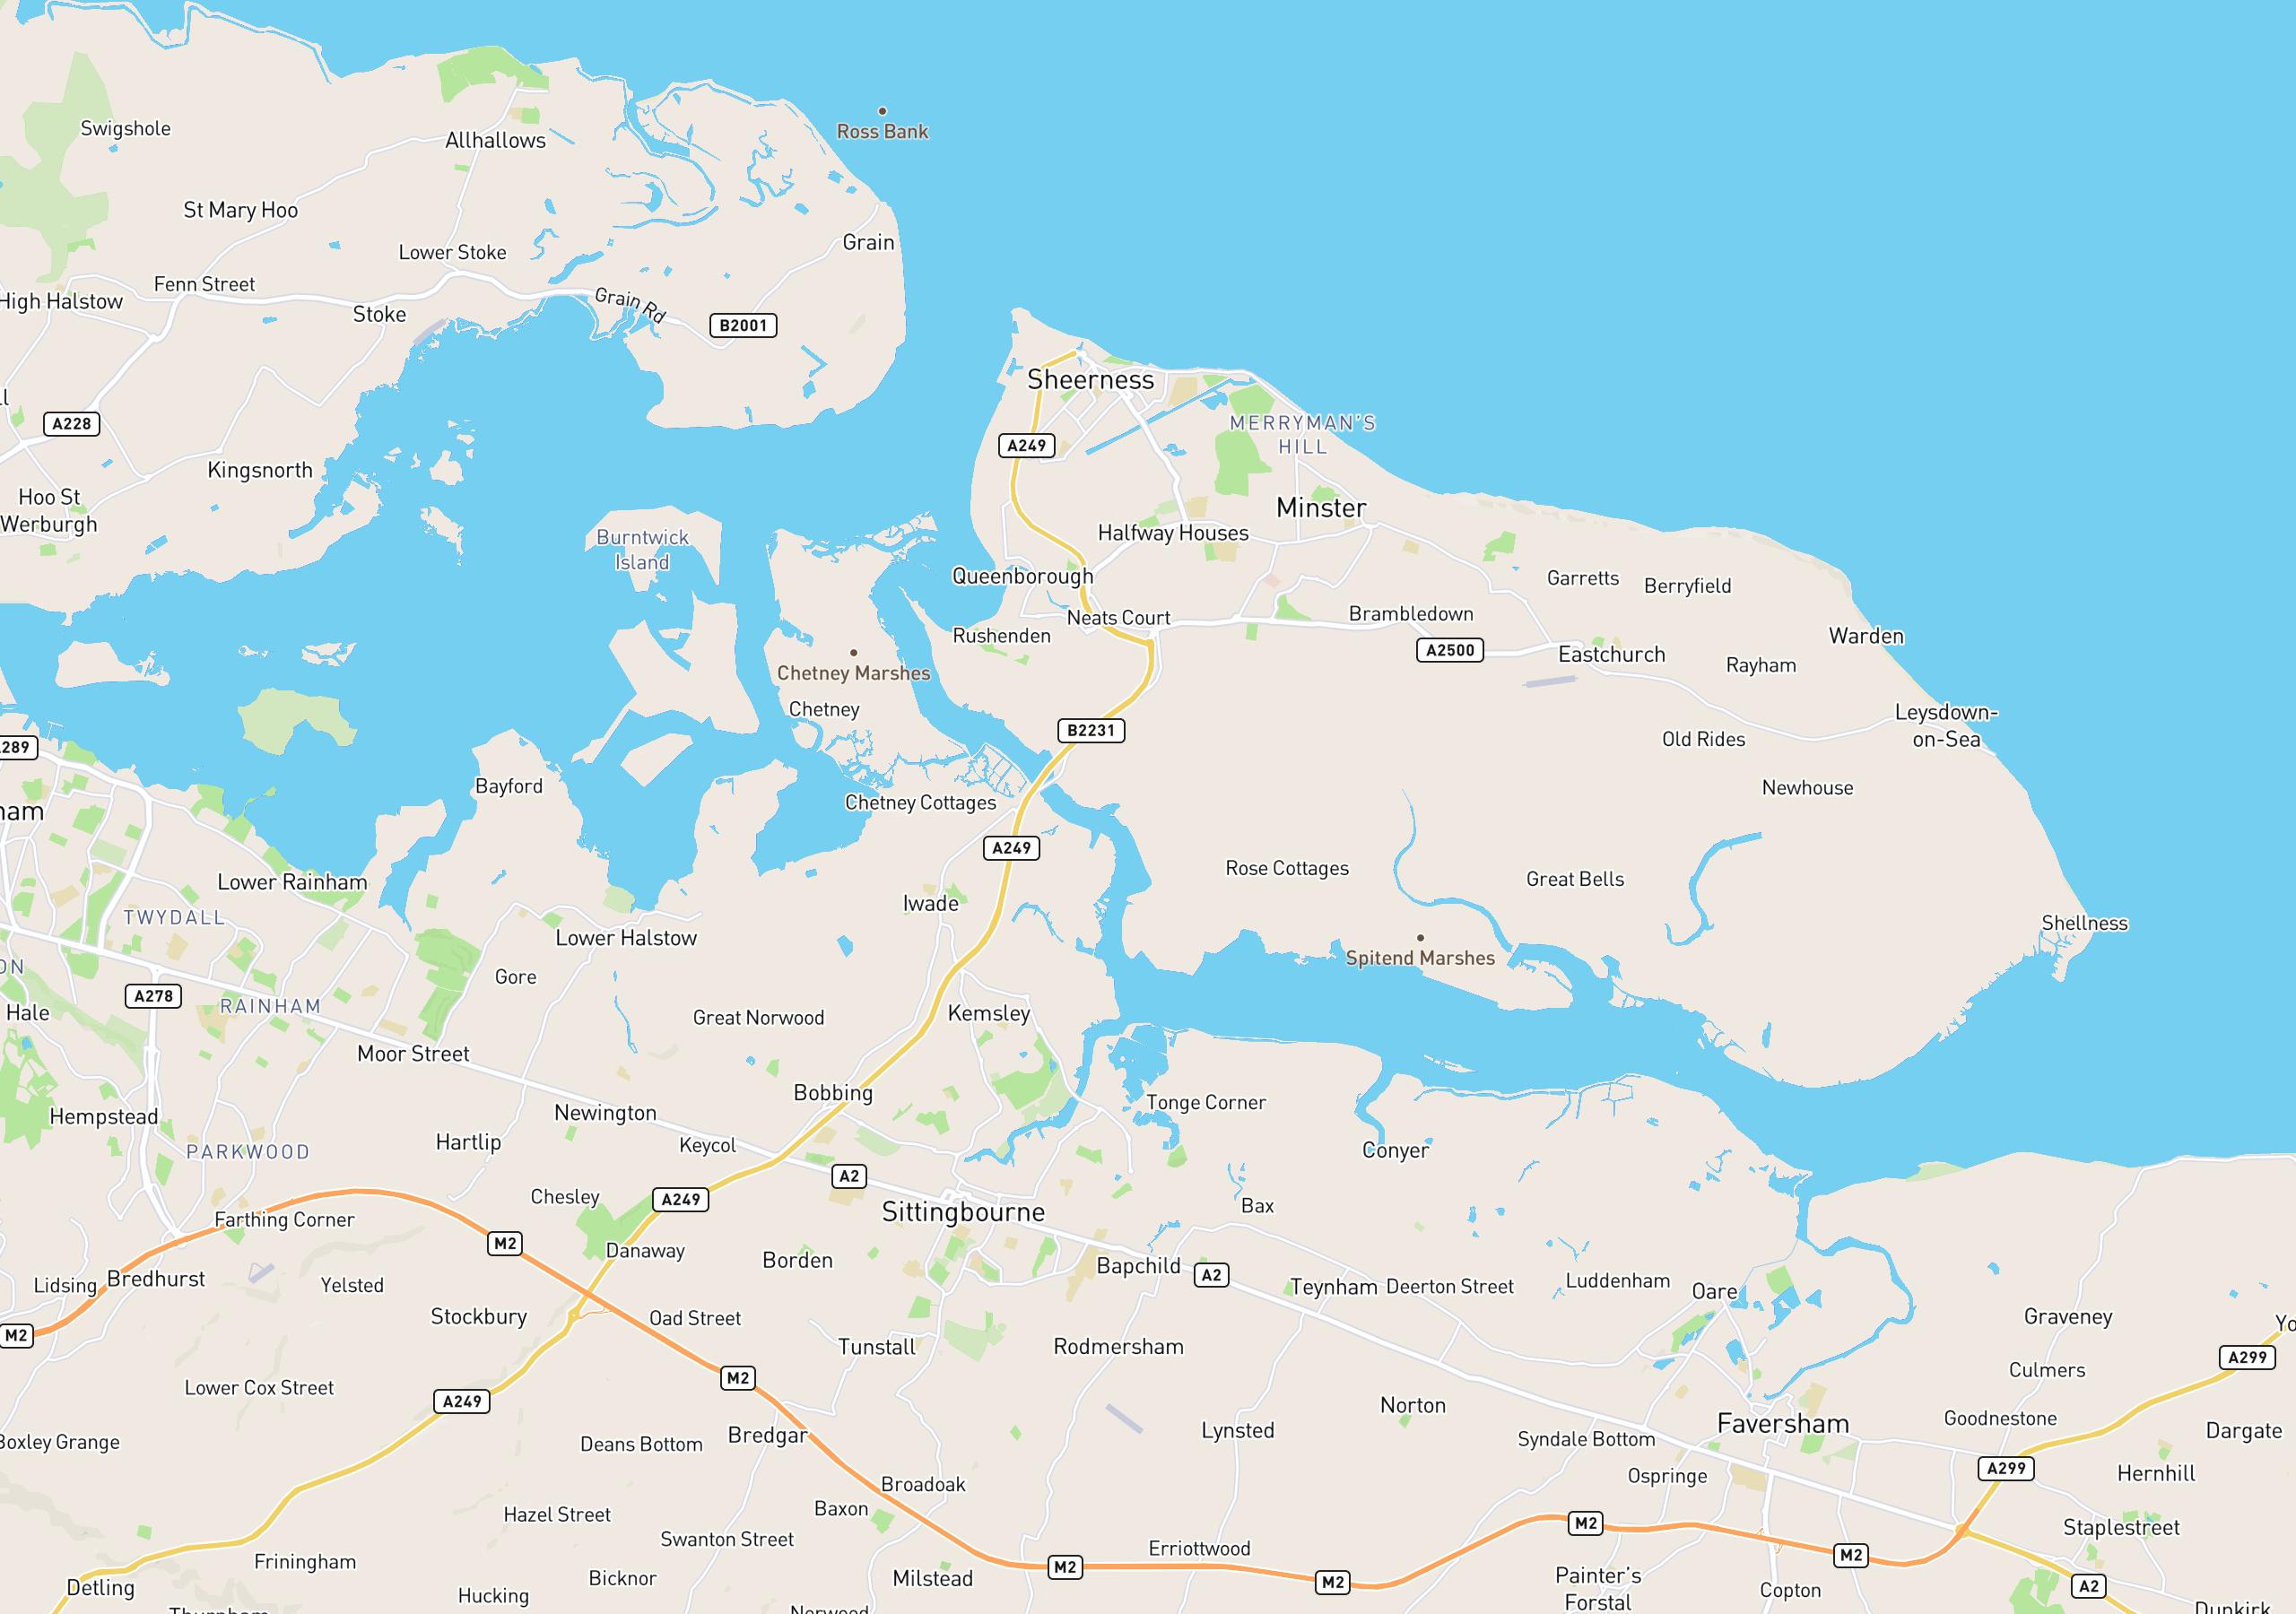 Map of club venues